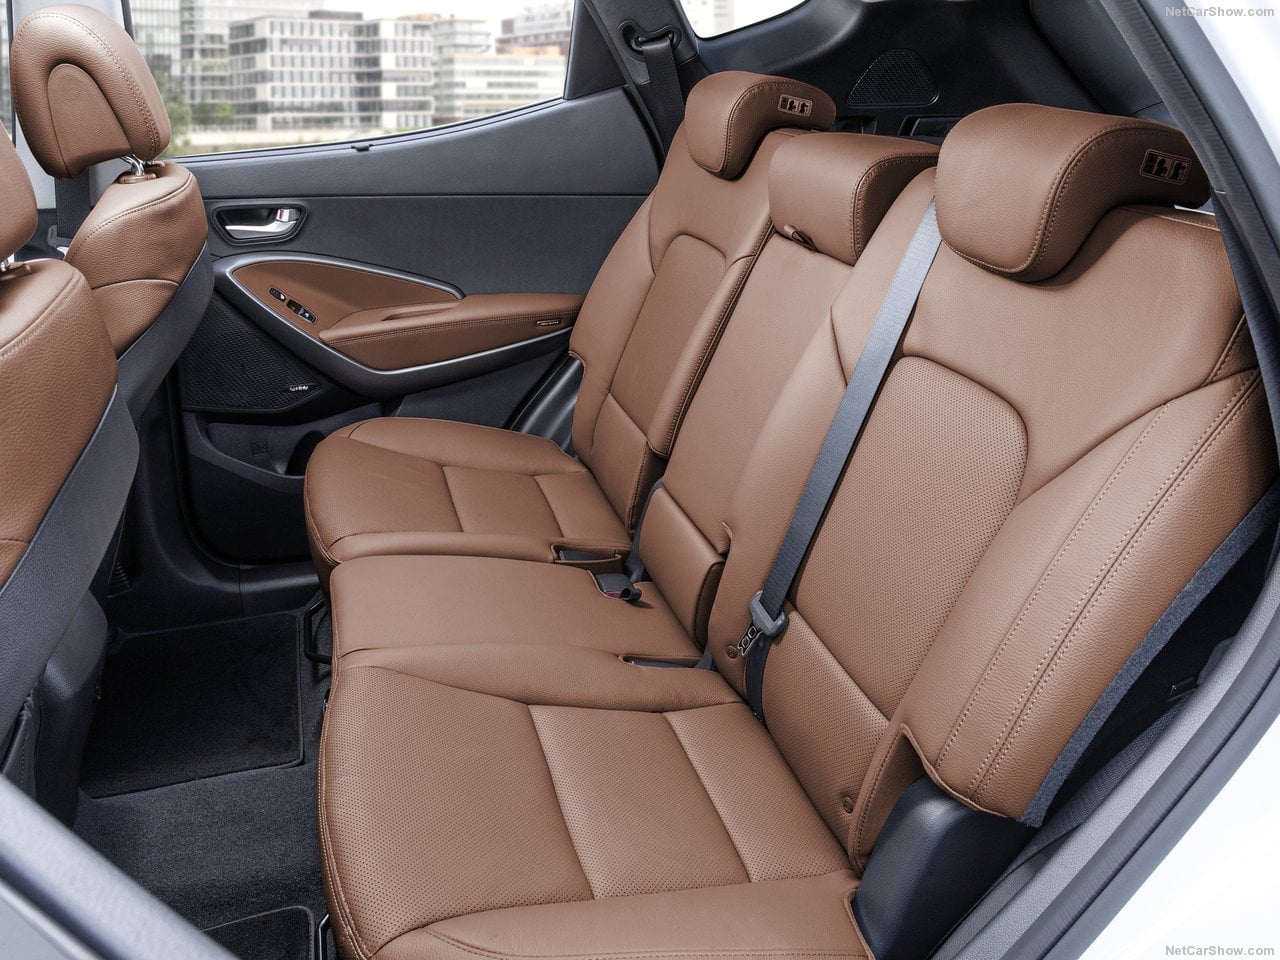 hyundai santa fe 2016 interior rear seat carblogindia. Black Bedroom Furniture Sets. Home Design Ideas